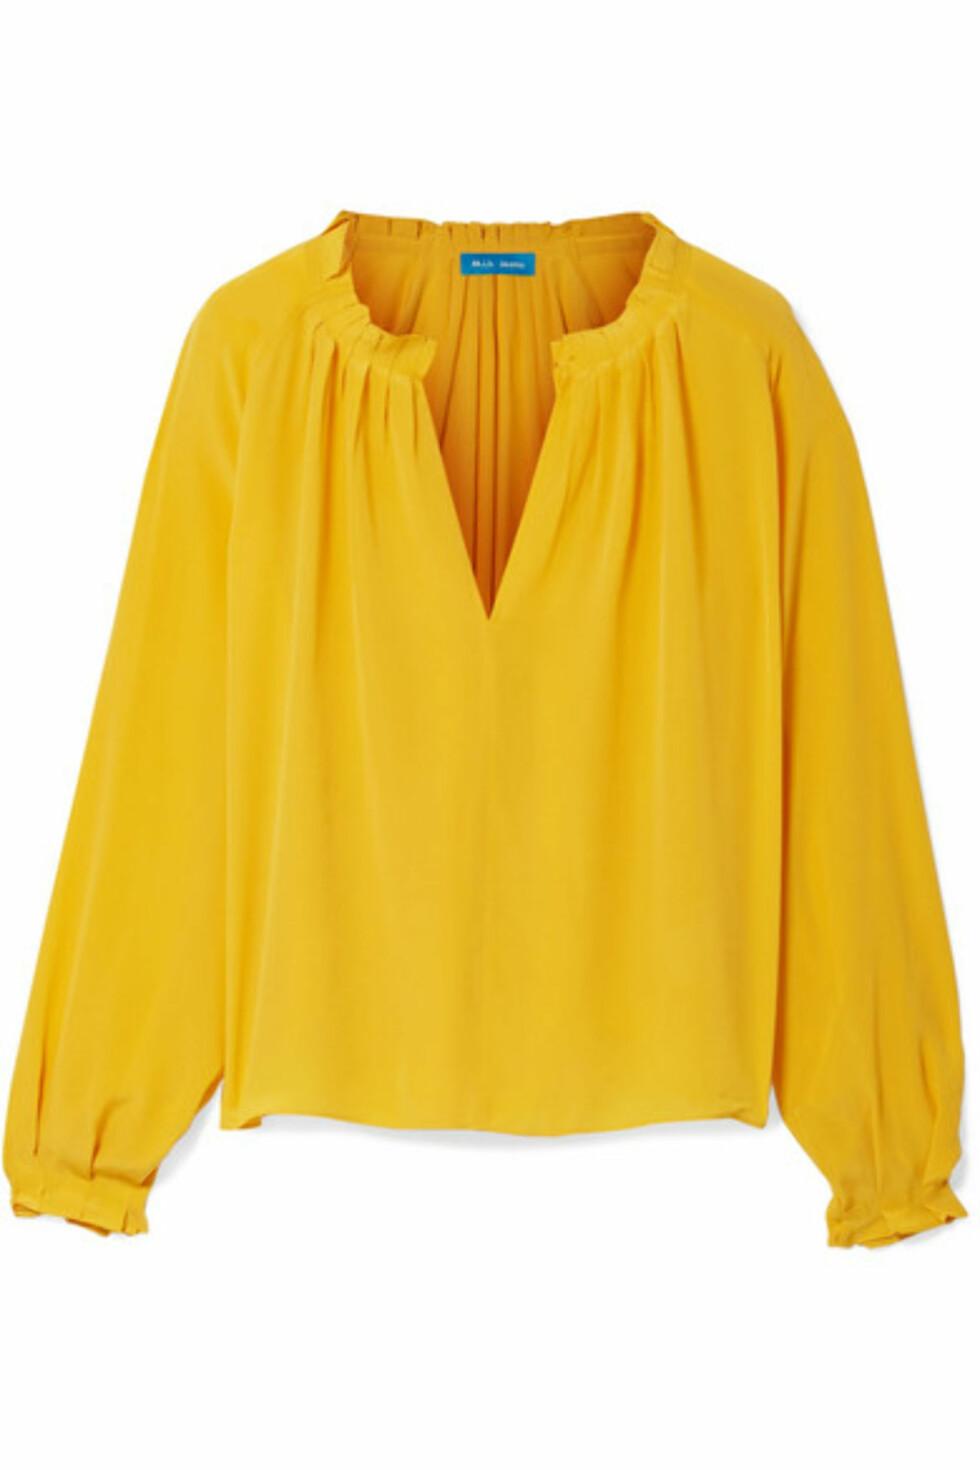 Topp fra M.I.H Jeans  2900,-  https://www.net-a-porter.com/gb/en/product/1024422/m_i_h_jeans/sidi-shirred-silk-blouse